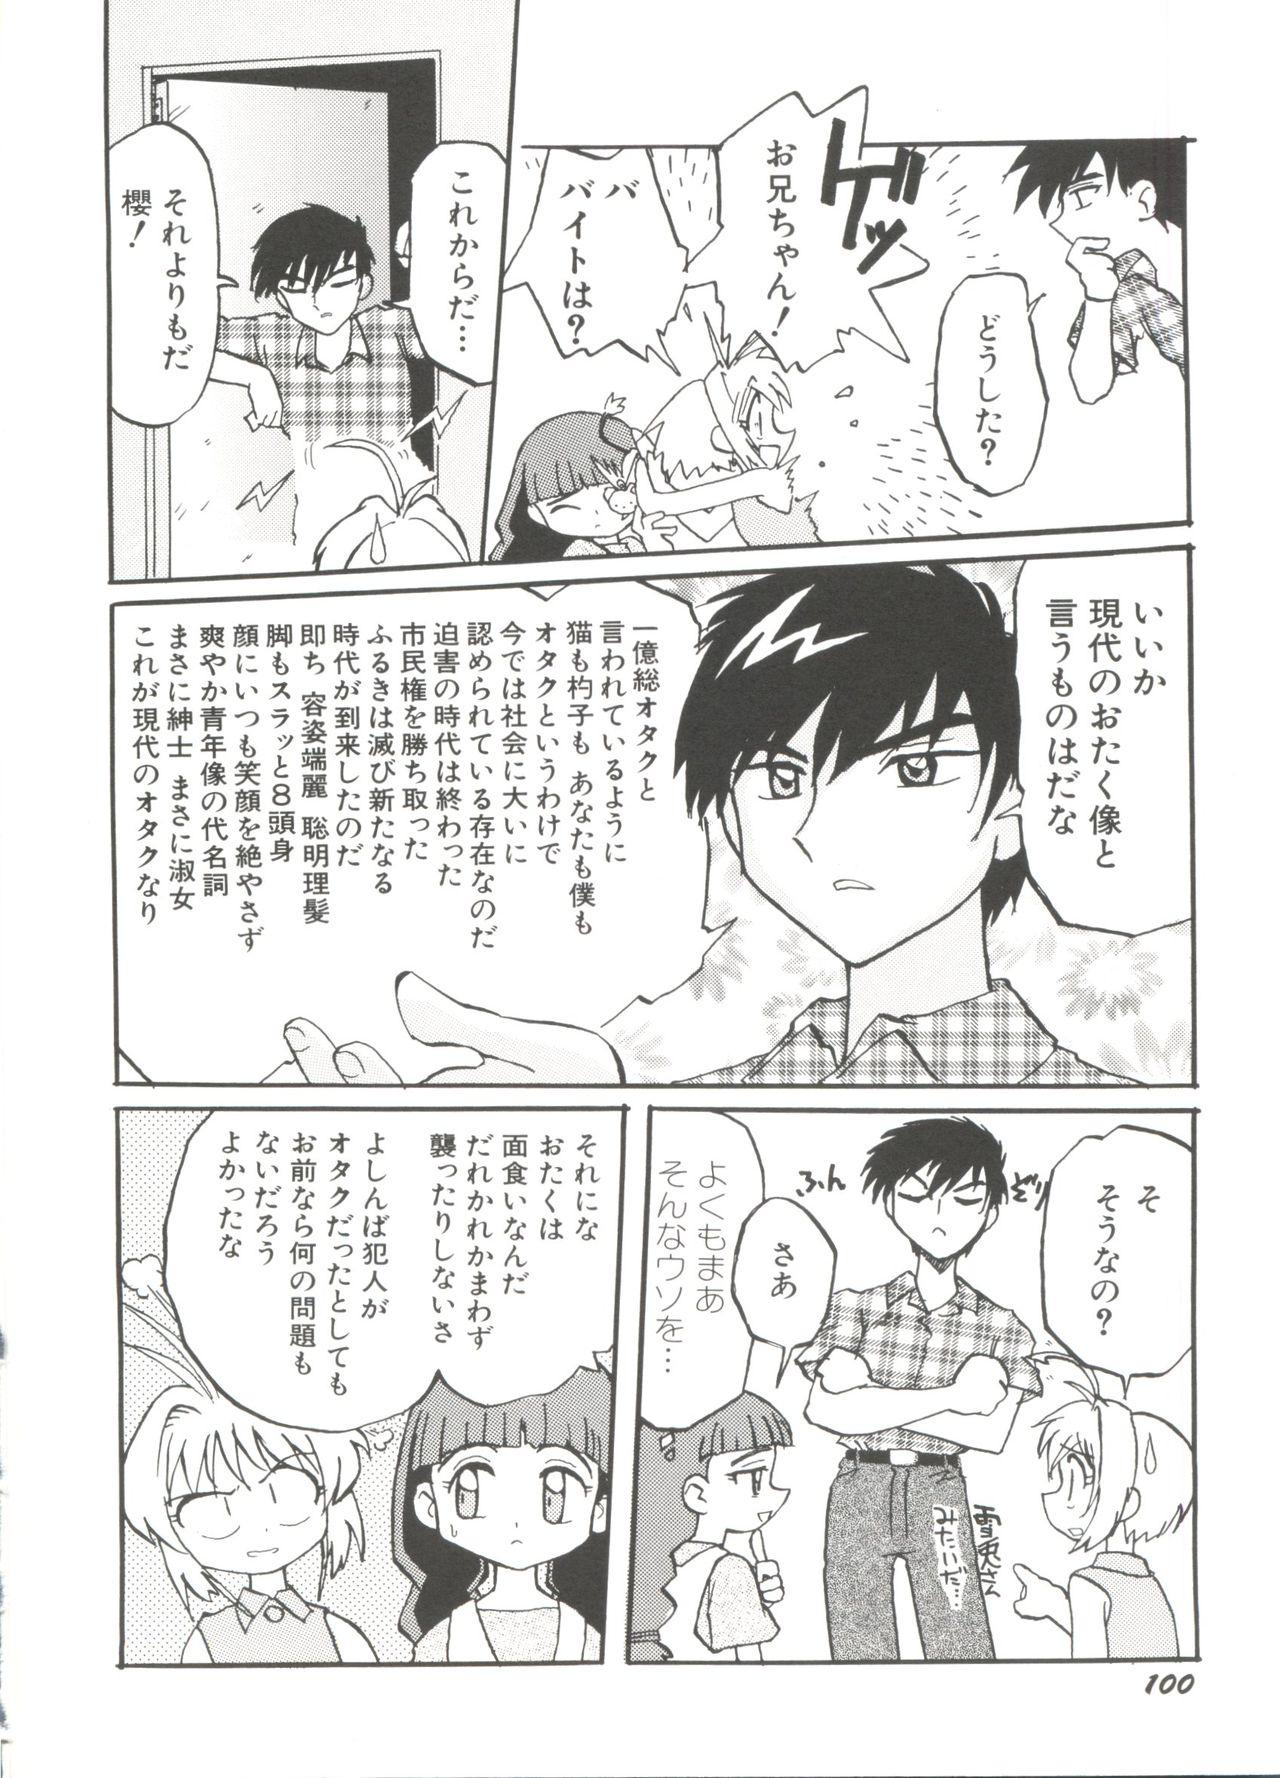 [Anthology] Denei Tamatebako 8 - Utakata no Tenshi-tachi II (Various) 101